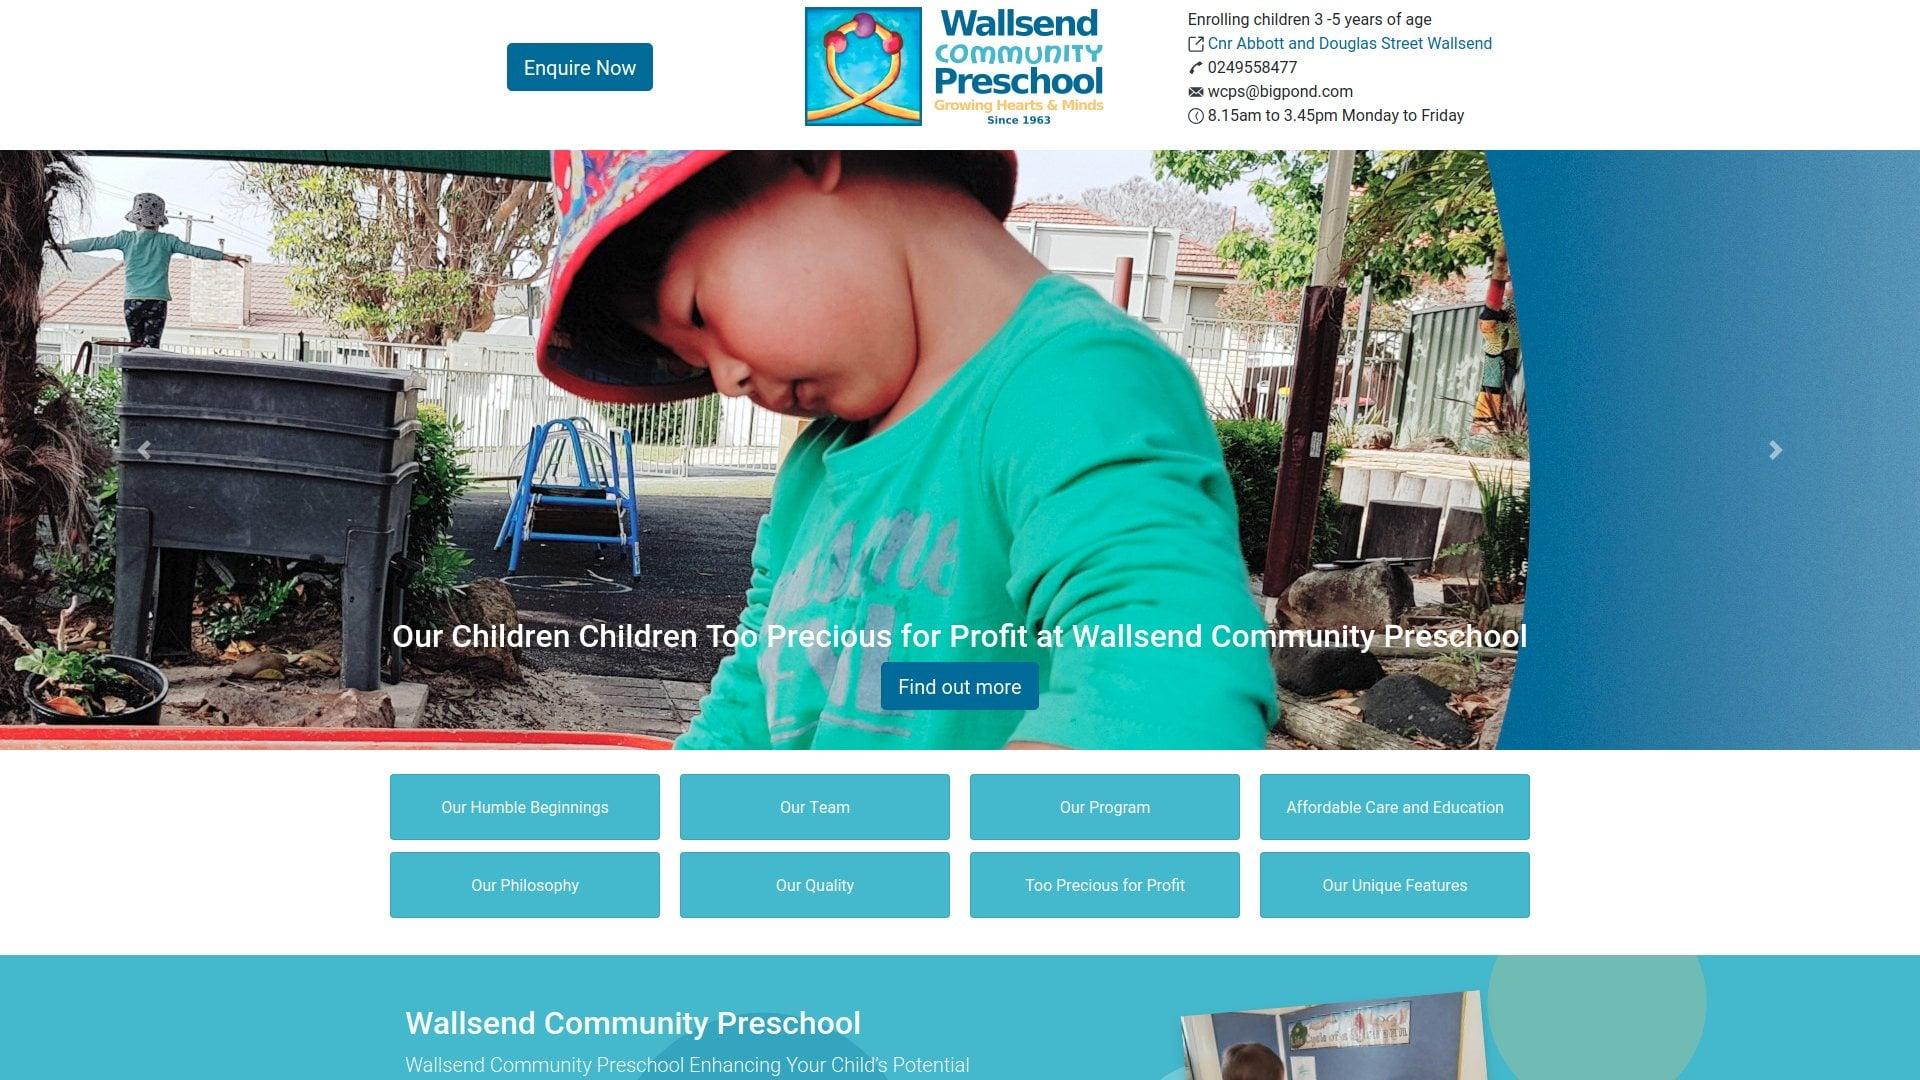 Wallsend preschool